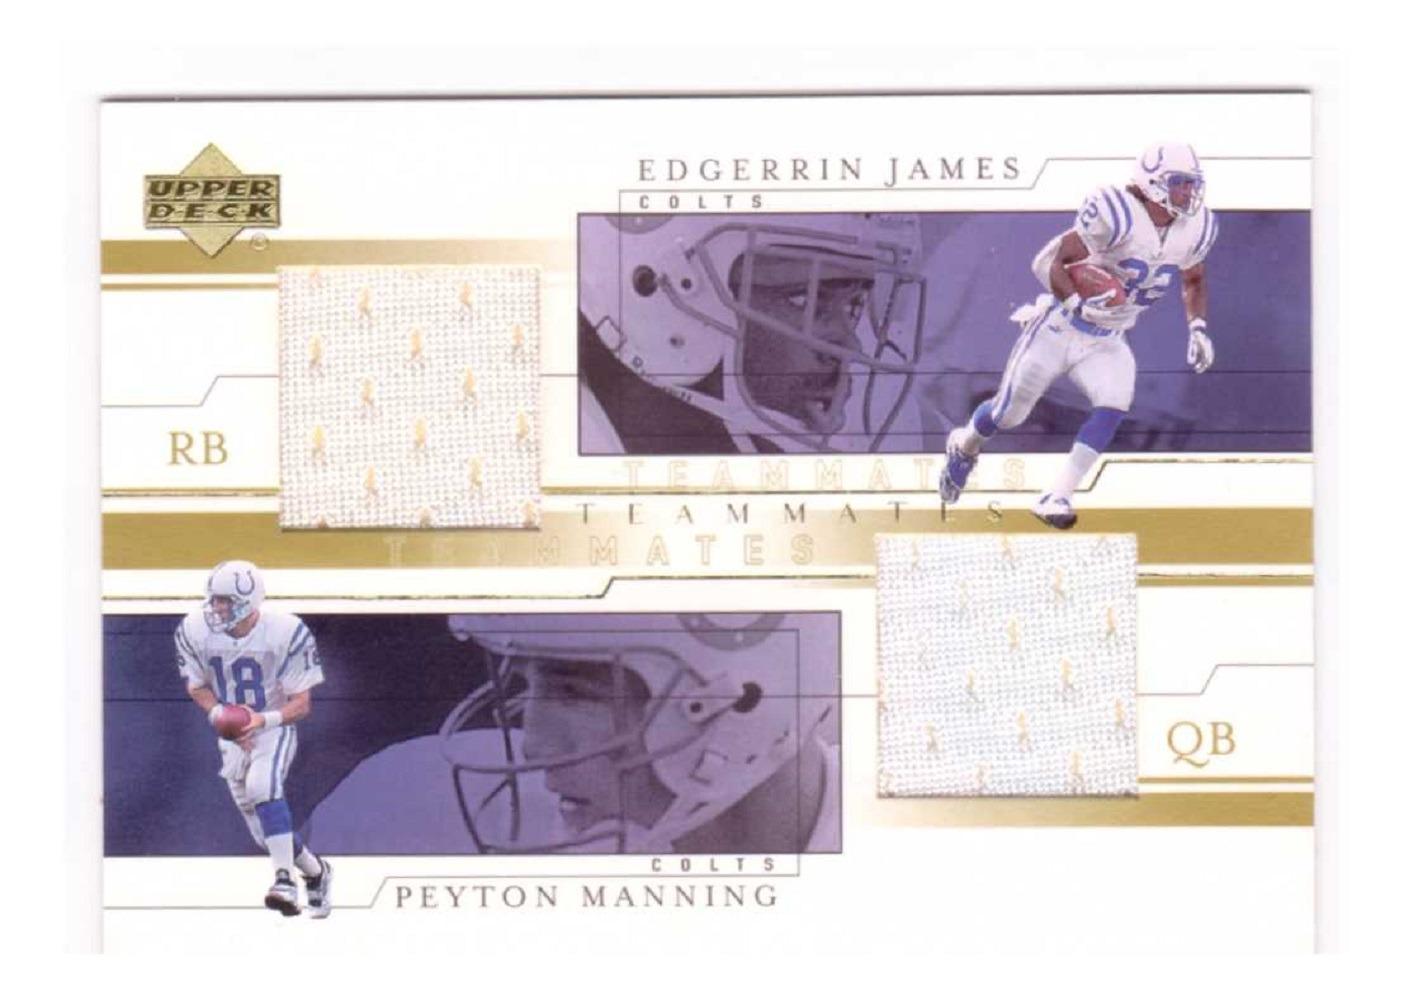 Peyton Manning Edgerrin James 2001 Upper Deck Teammates Dual Jersey Relic #MJT